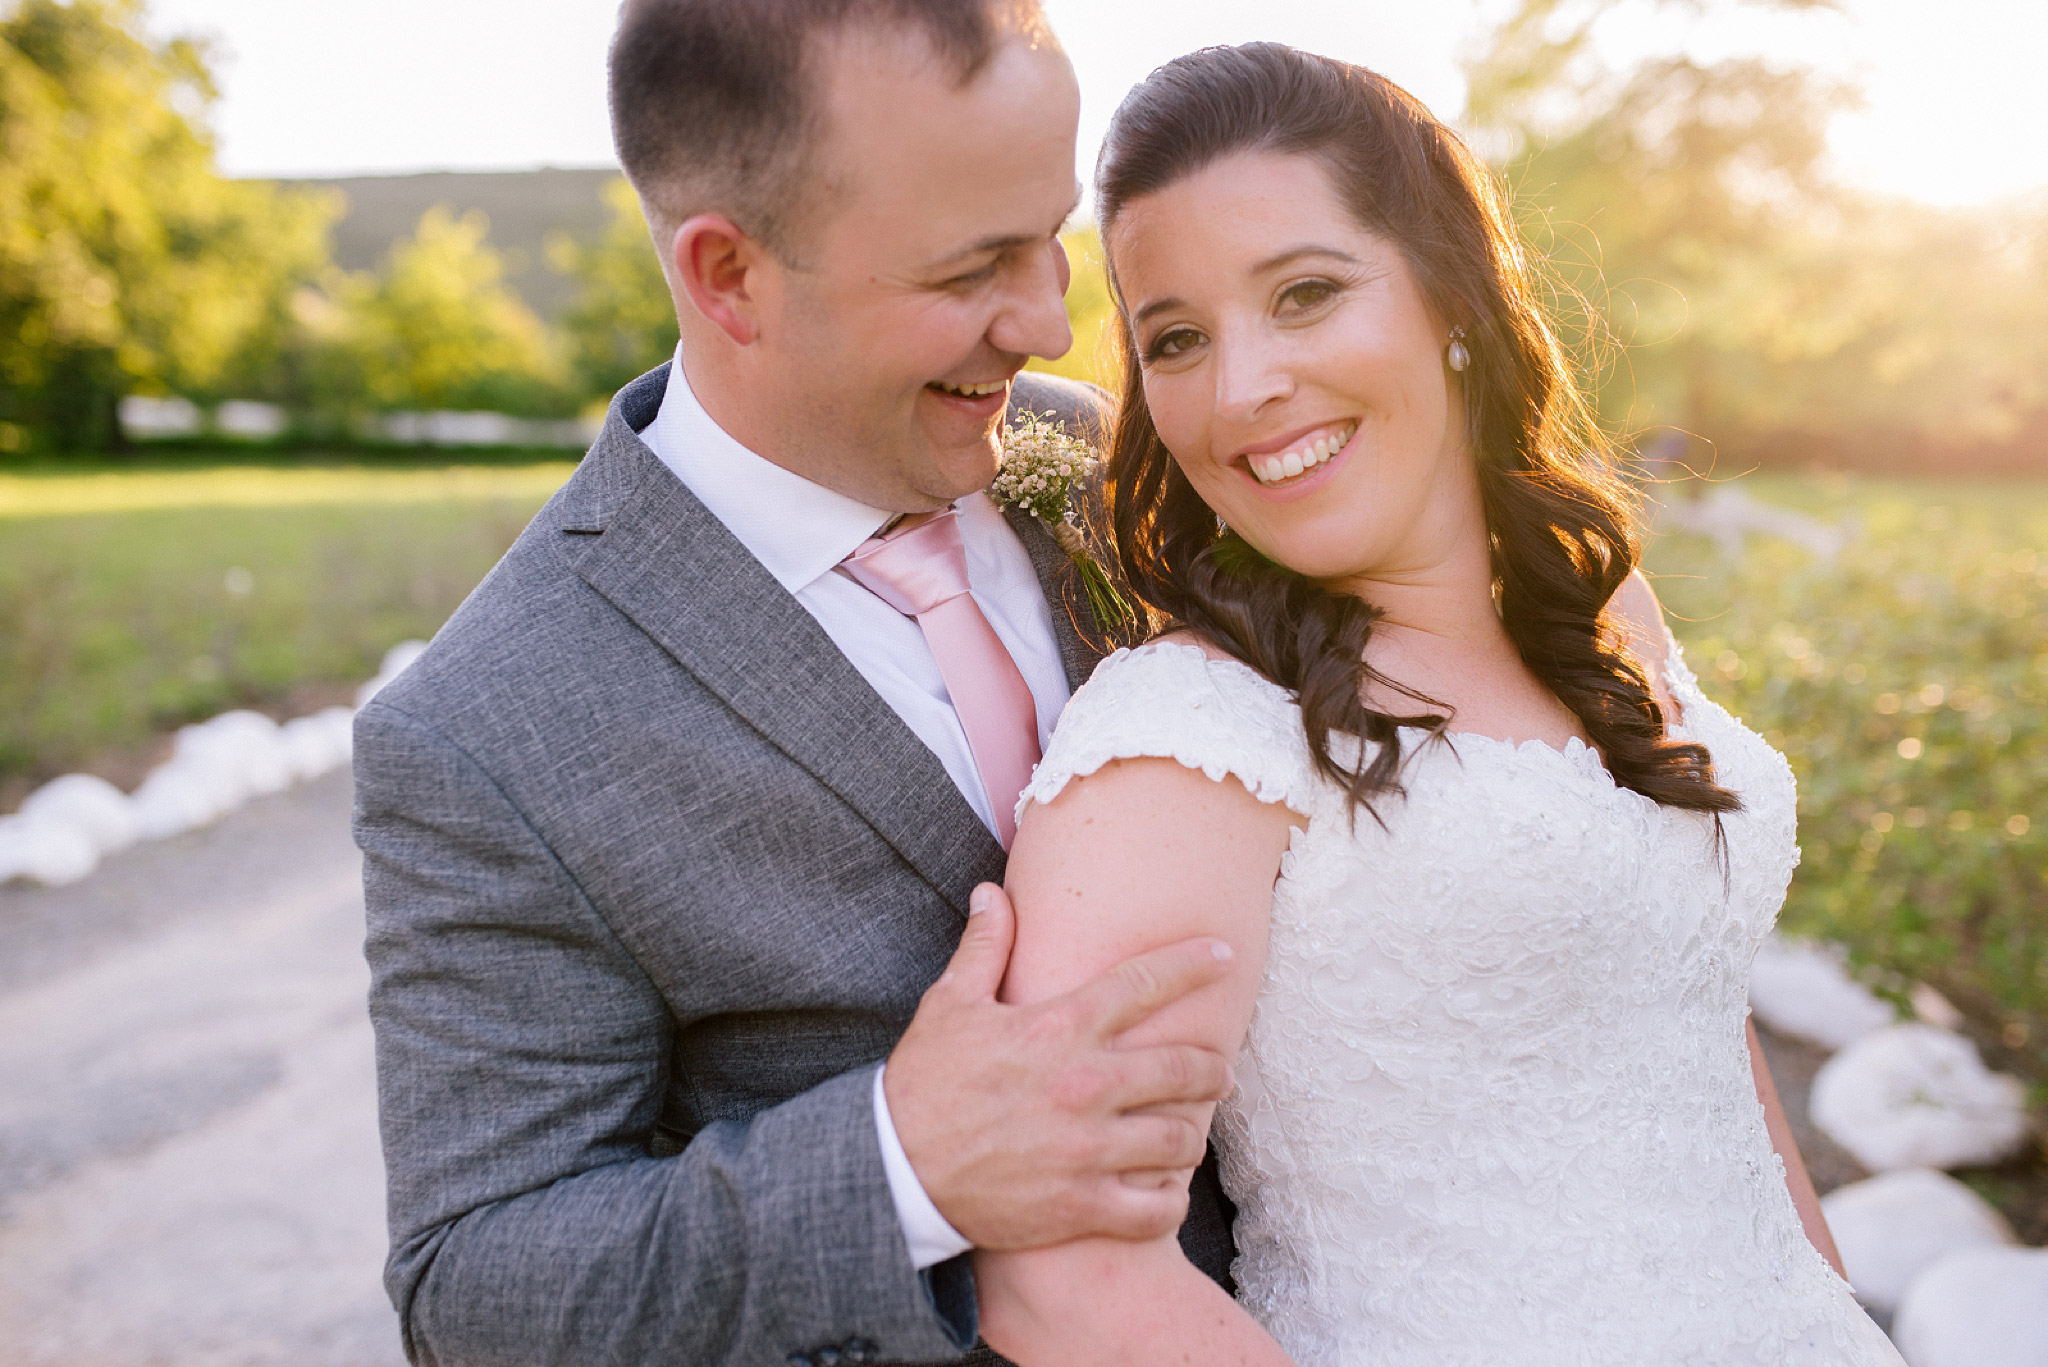 bianca-trevor-knorhoek-stellenbosch-wedding-cheryl-mcewan-stellenbosch-wedding-photographer37